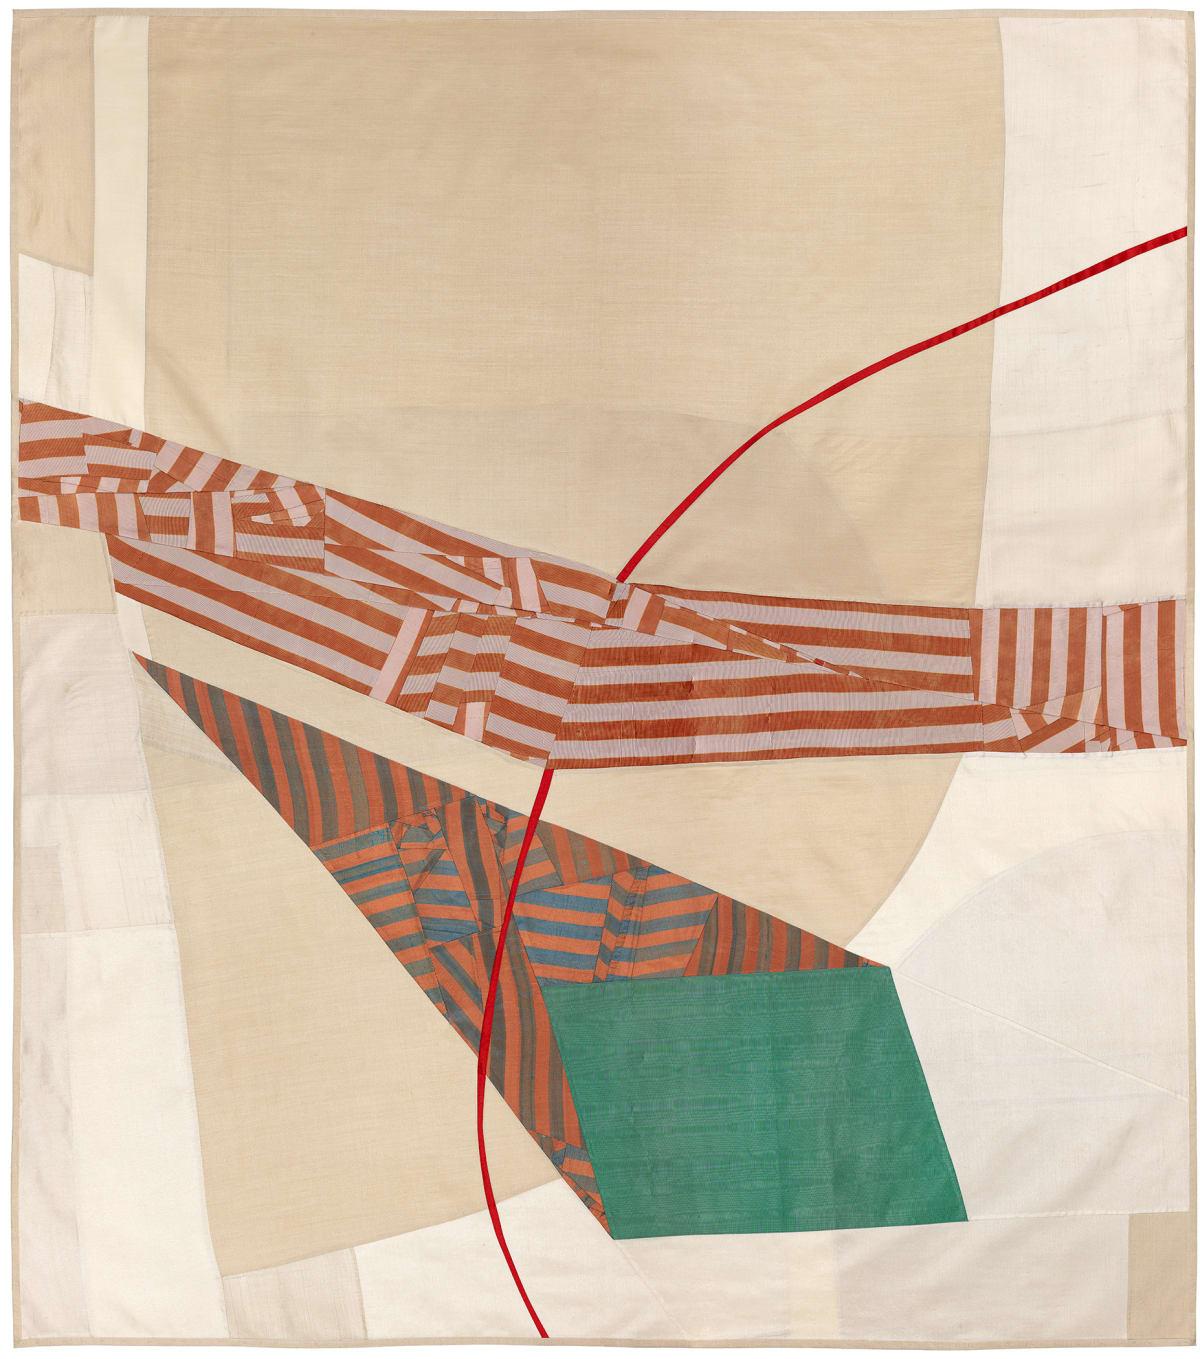 Debra Smith Silence is Unclear, 2, 2015 pieced vintage silk 58 x 51 in.